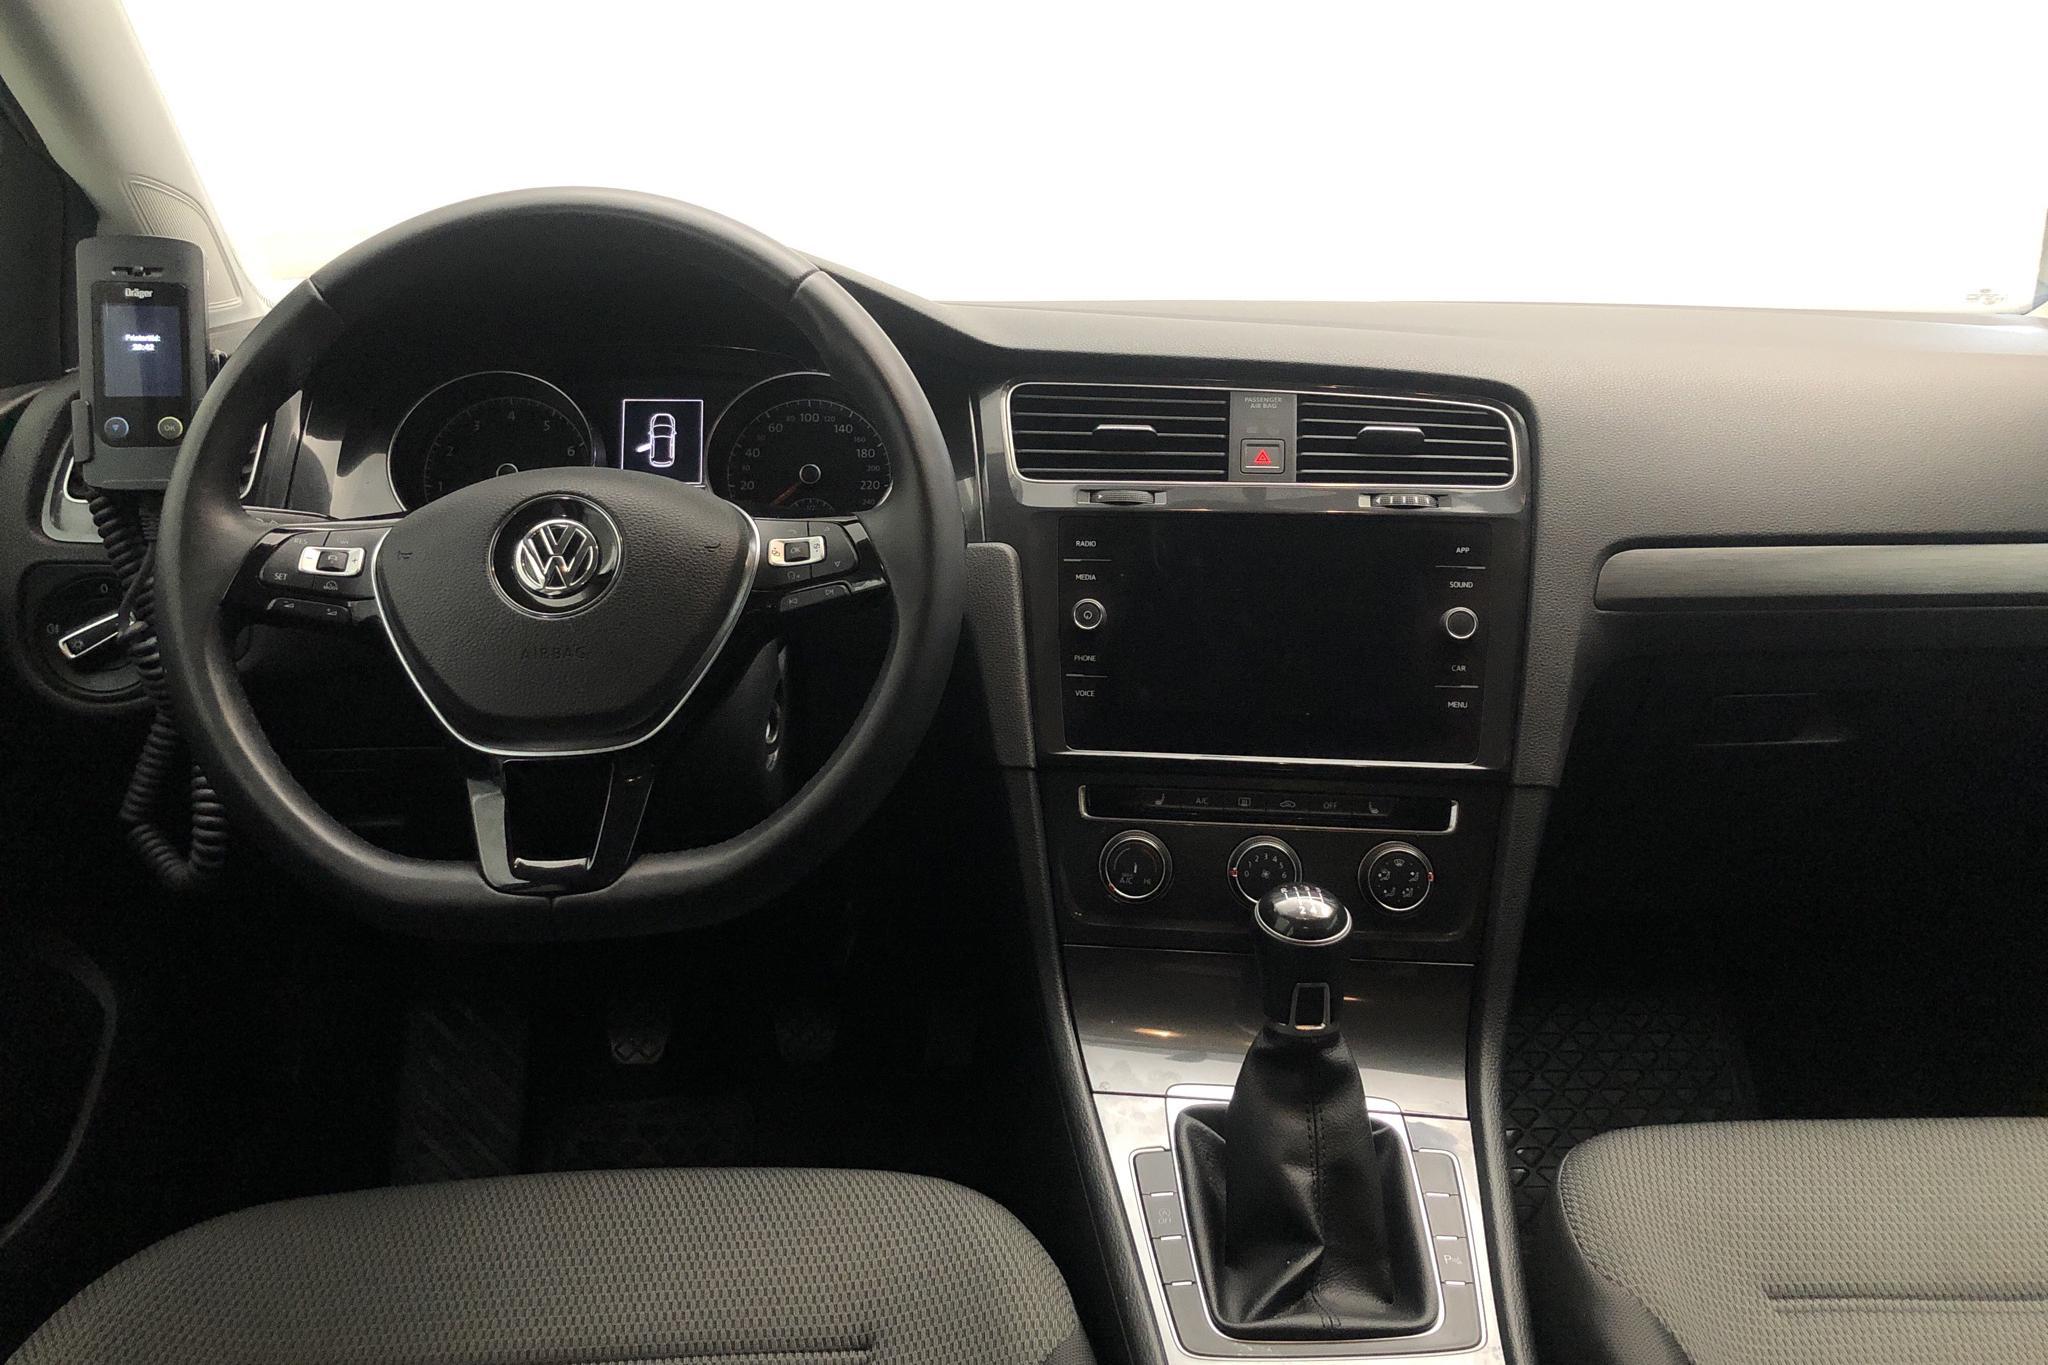 VW Golf VII 1.4 TSI Multifuel 5dr (125hk) - 2 756 mil - Manuell - Dark Grey - 2018